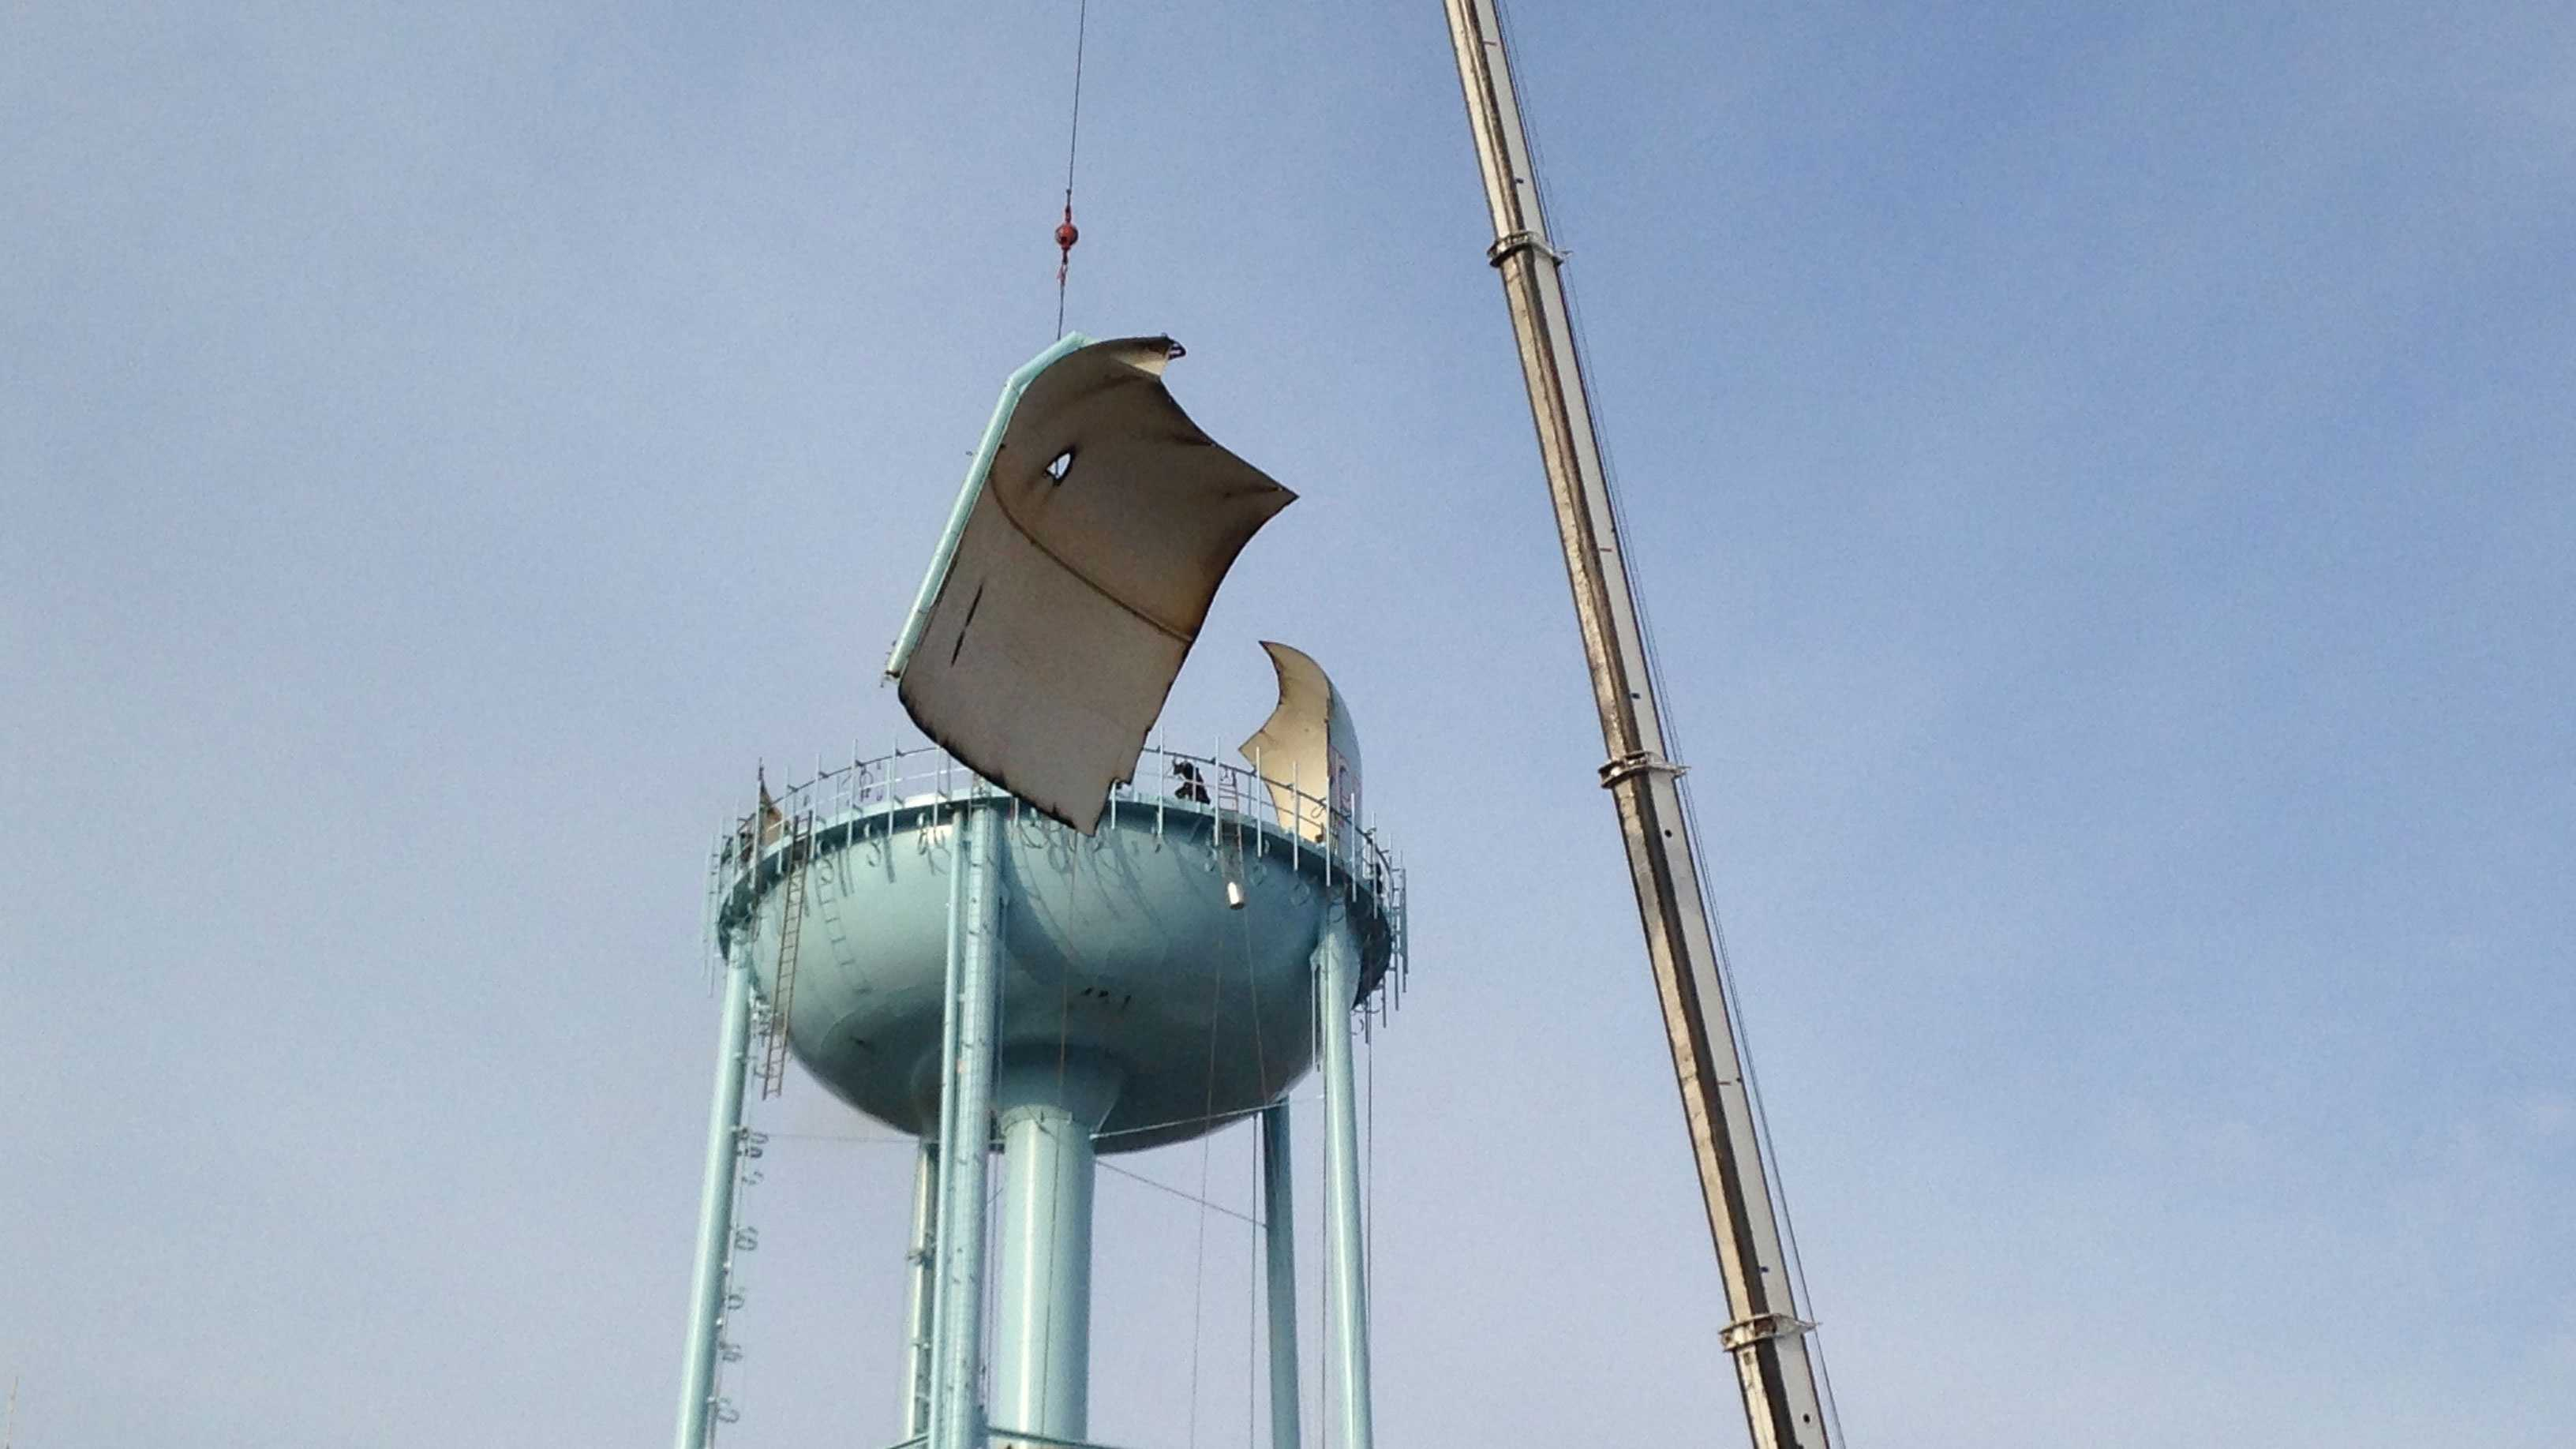 Blue Springs water tower dismantling image 2